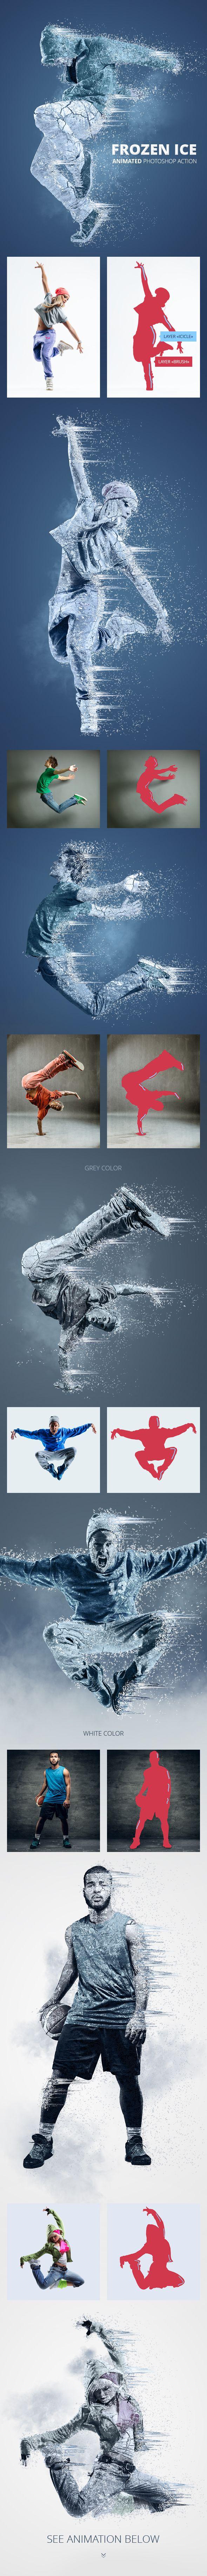 Frozen Ice Animated Photoshop Action — Photoshop ATN #inimation action #blue photoshop action • Download ➝ https://graphicriver.net/item/frozen-ice-animated-photoshop-action/19432116?ref=pxcr